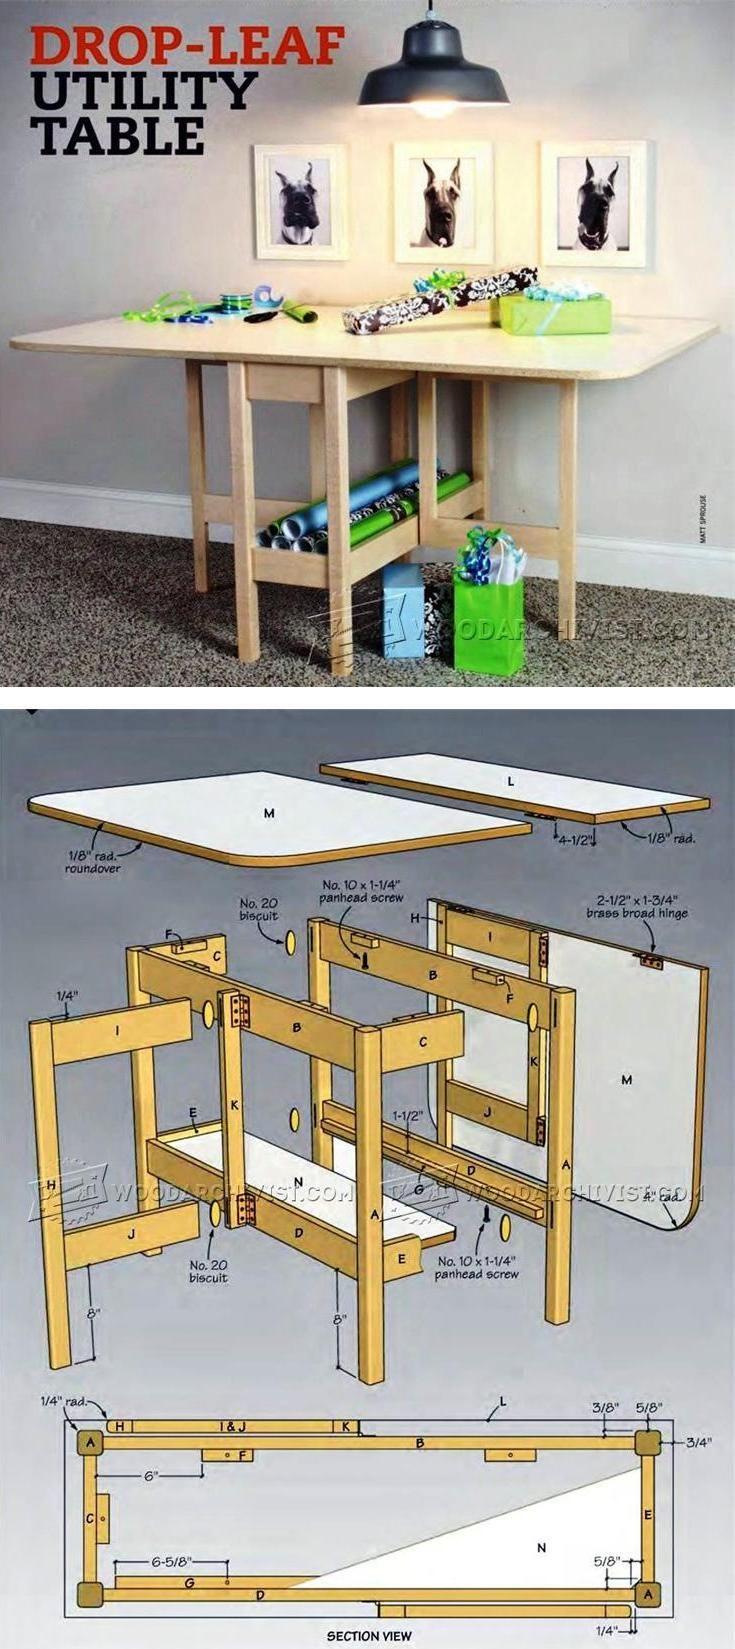 Drop Leaf Table Plans - Furniture Plans and Projects | WoodArchivist ...